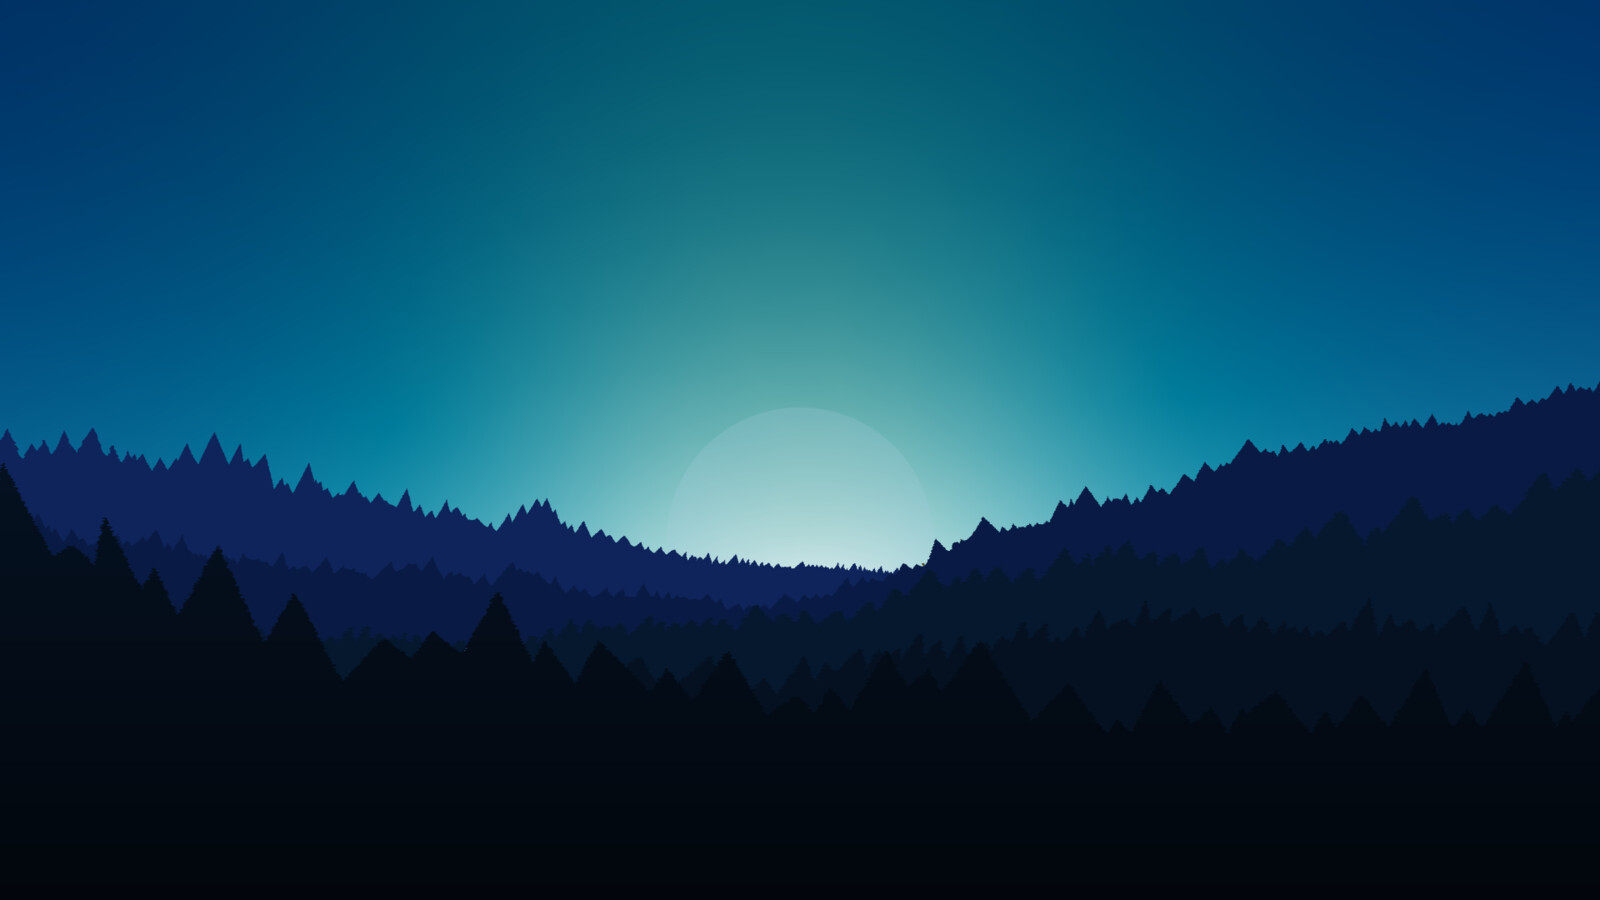 Wallpaper for PC https://www.heroscreen.cc/2021/02/minimalist-pc-wallpaper-4k.html